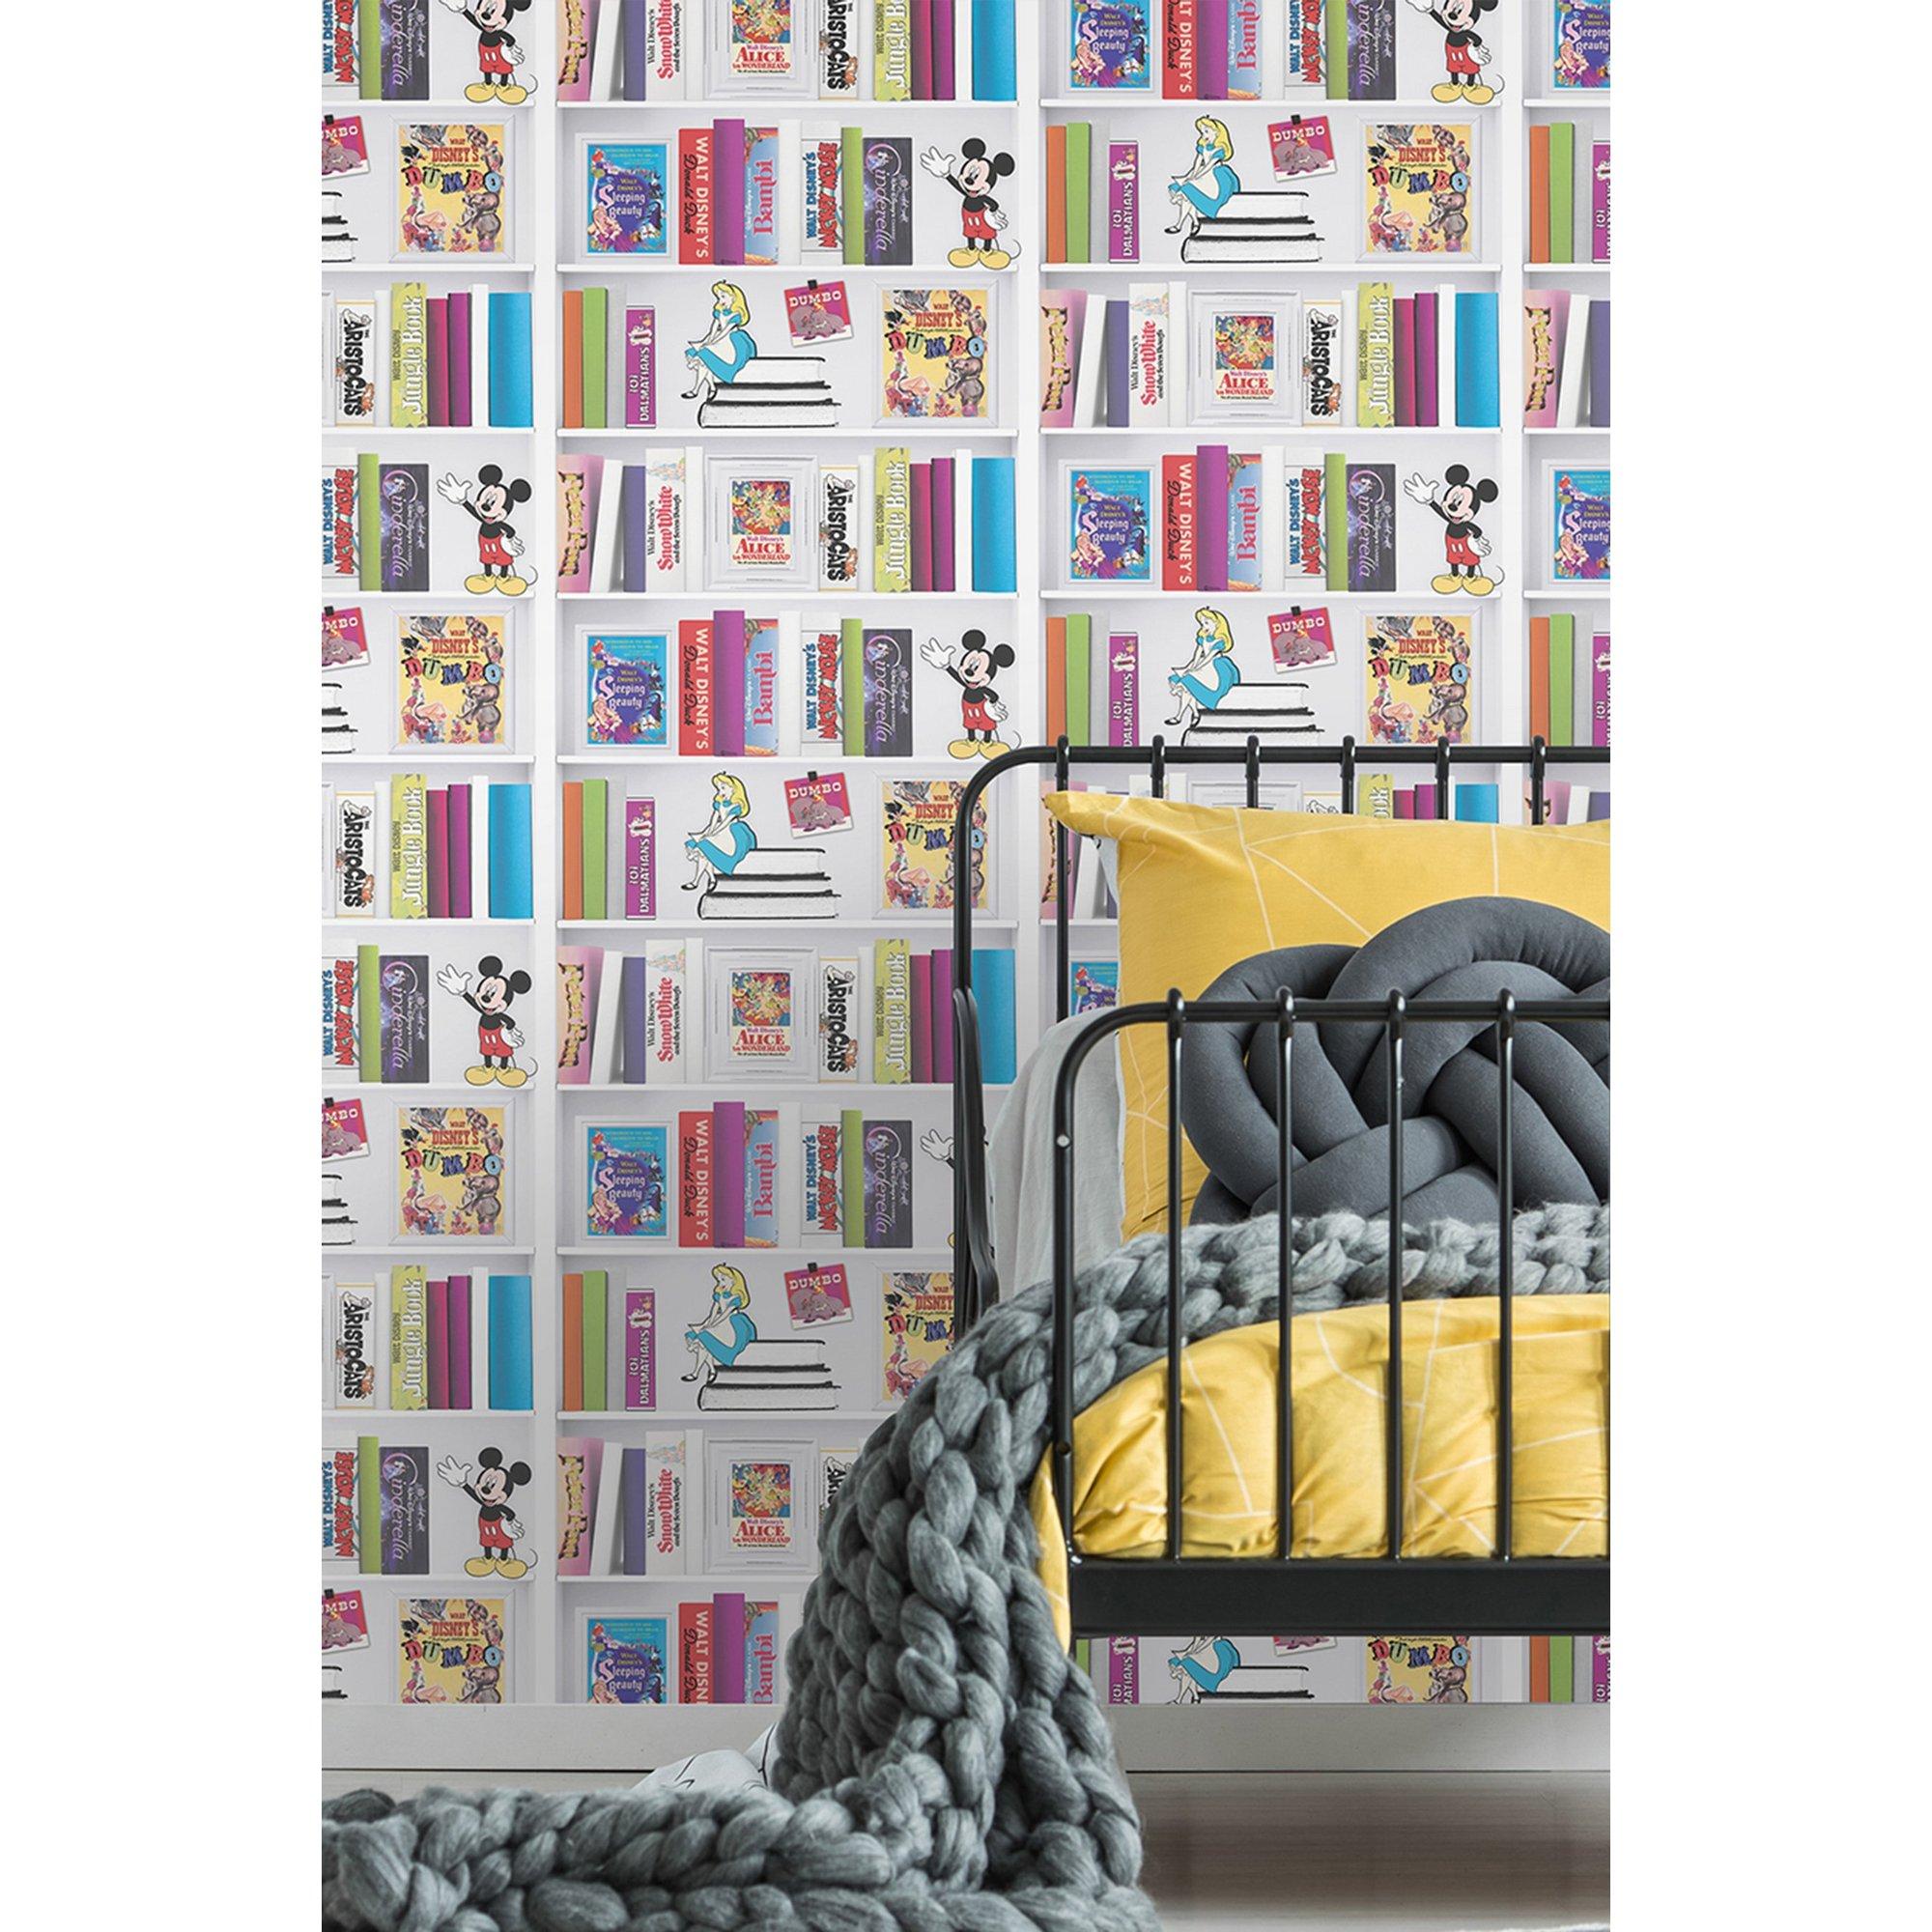 Image of Disney Character Bookshelf Wallpaper